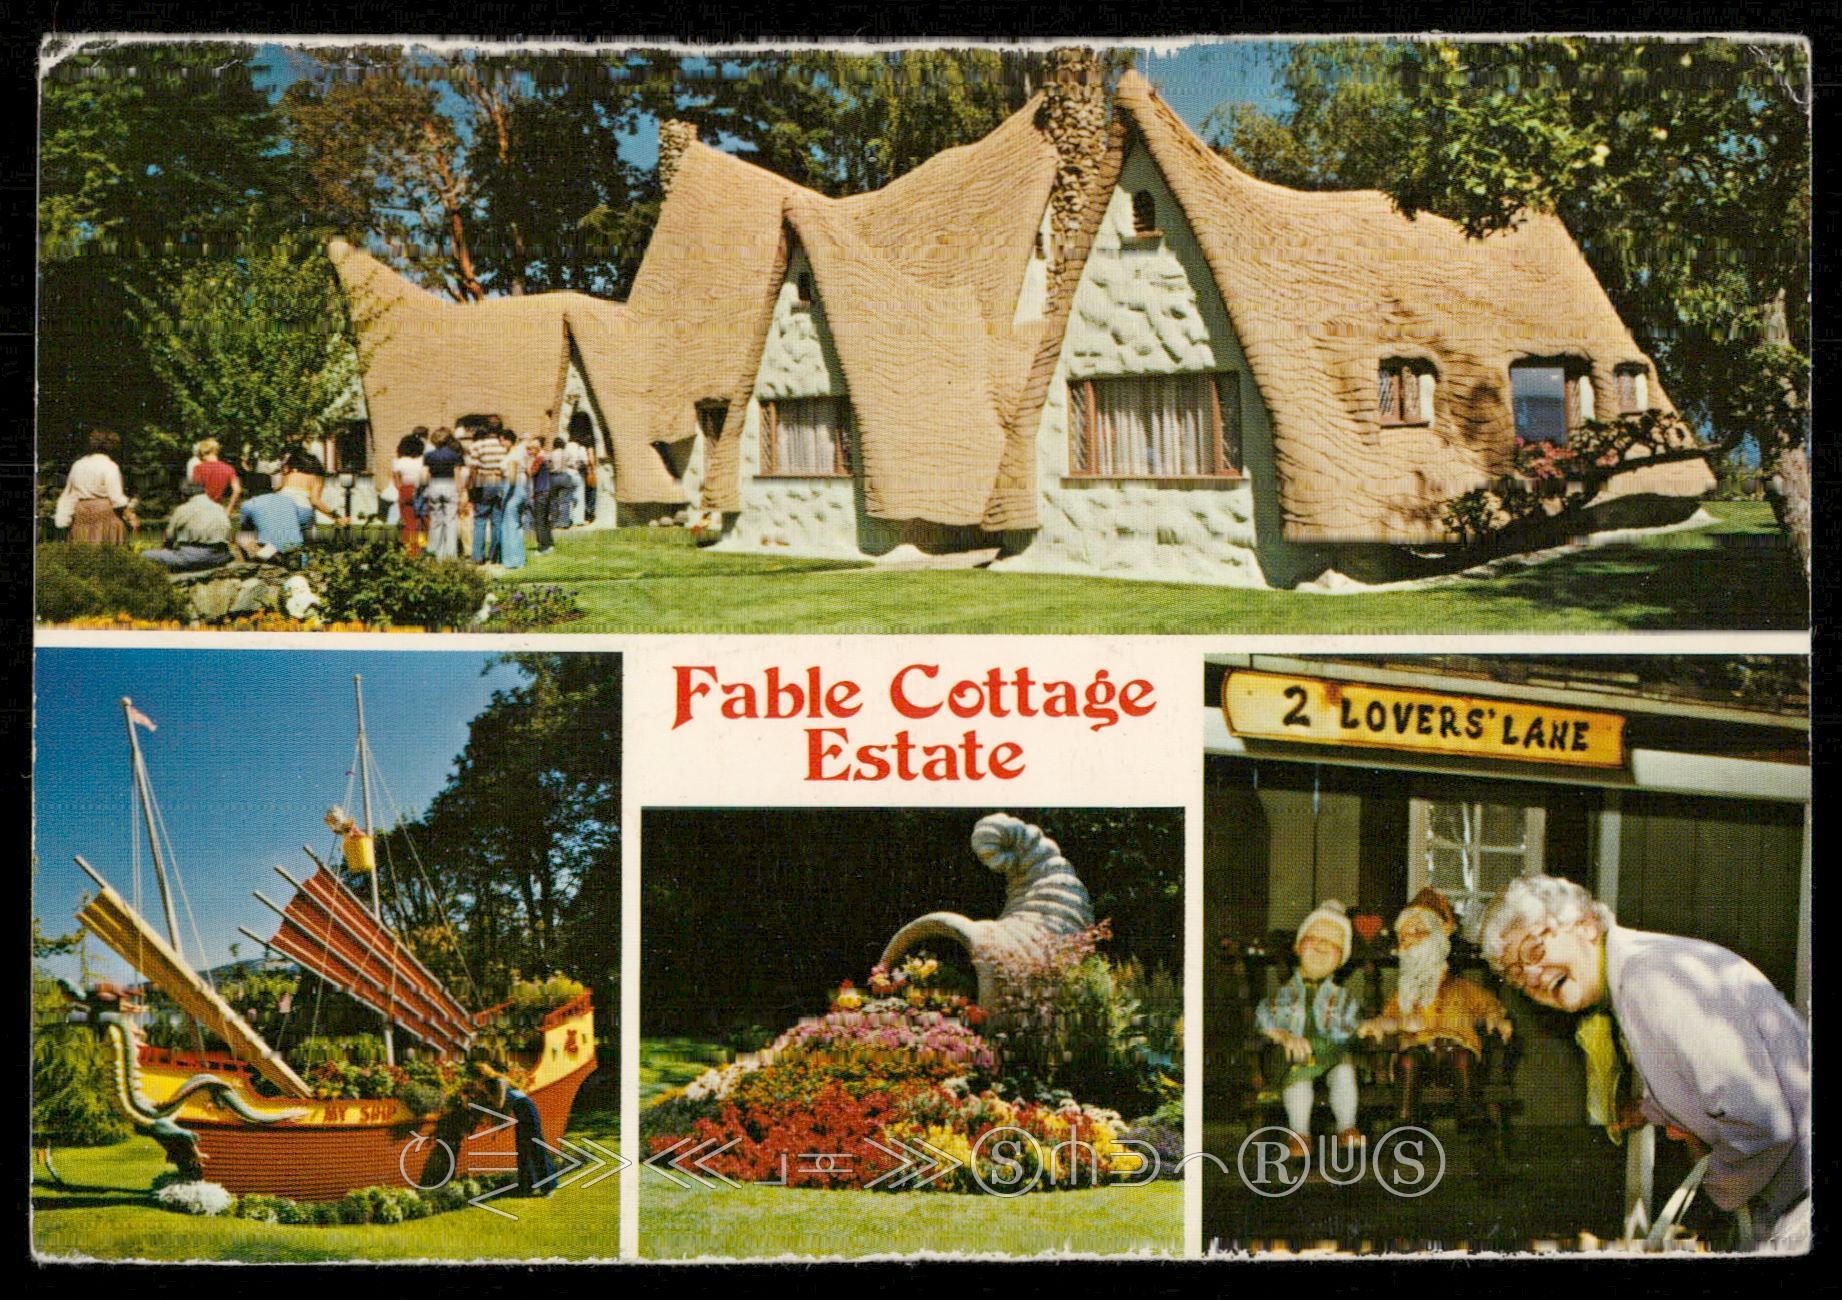 Fable Cottage Estate / HipPostcard